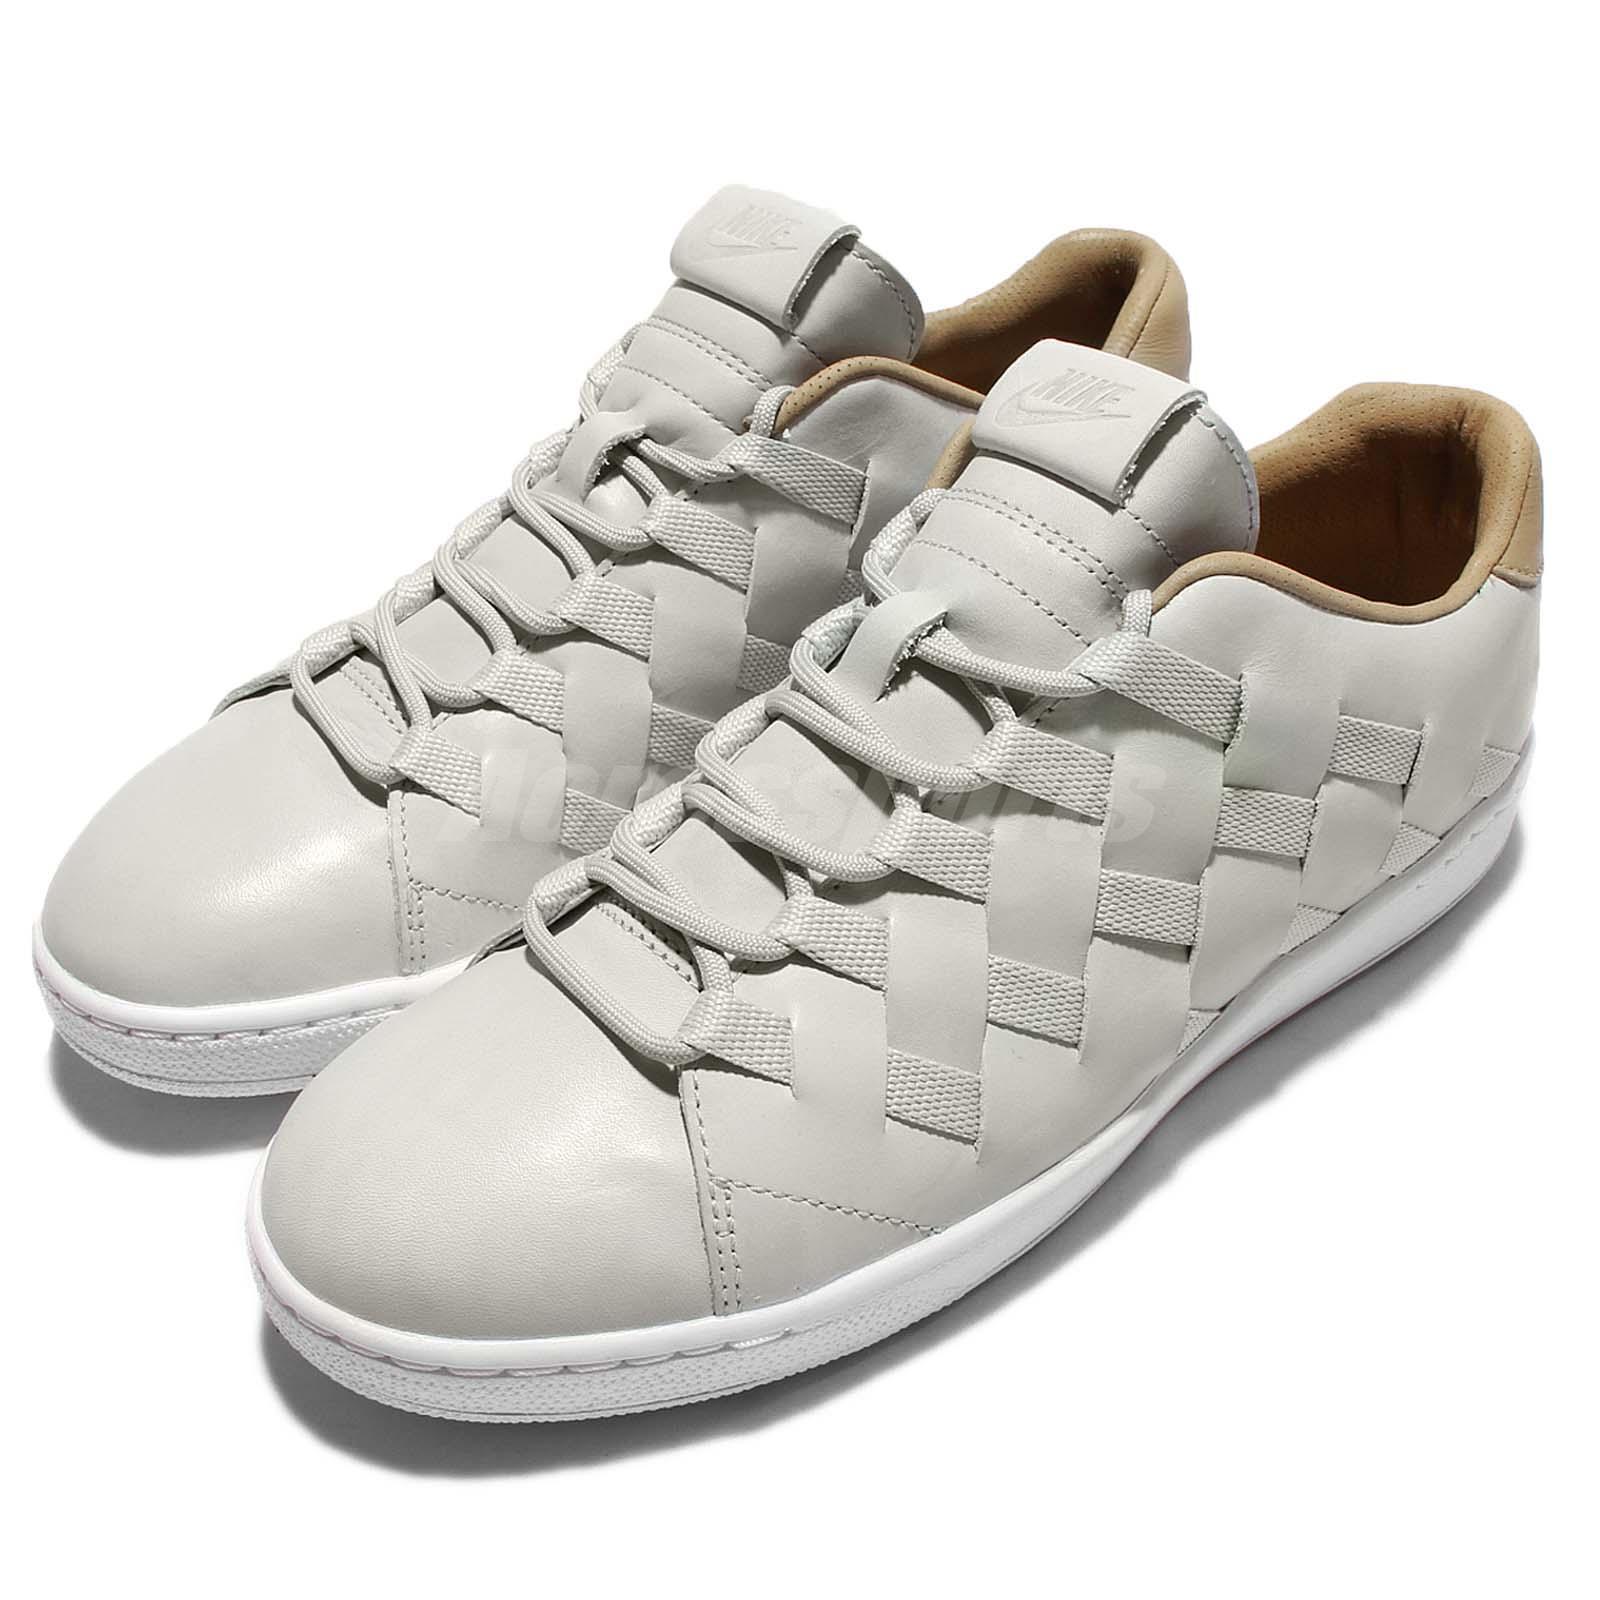 Nike Air Zoom Tennis Classic AC / Ultra / / / CS / Ease Hombre / Mujer Zapatos Pick 1 d3da54